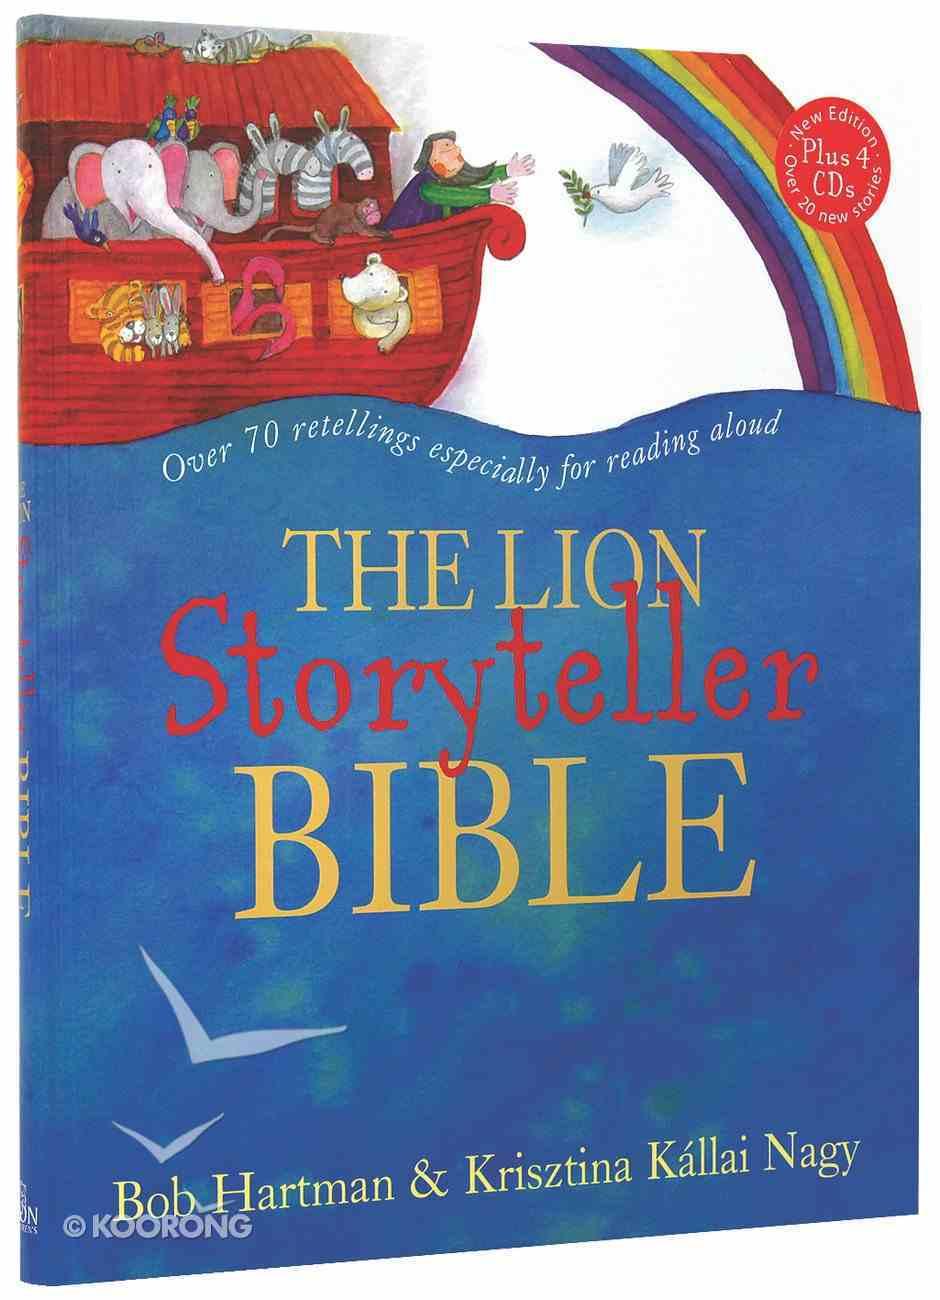 The Lion Storyteller Bible Hardback